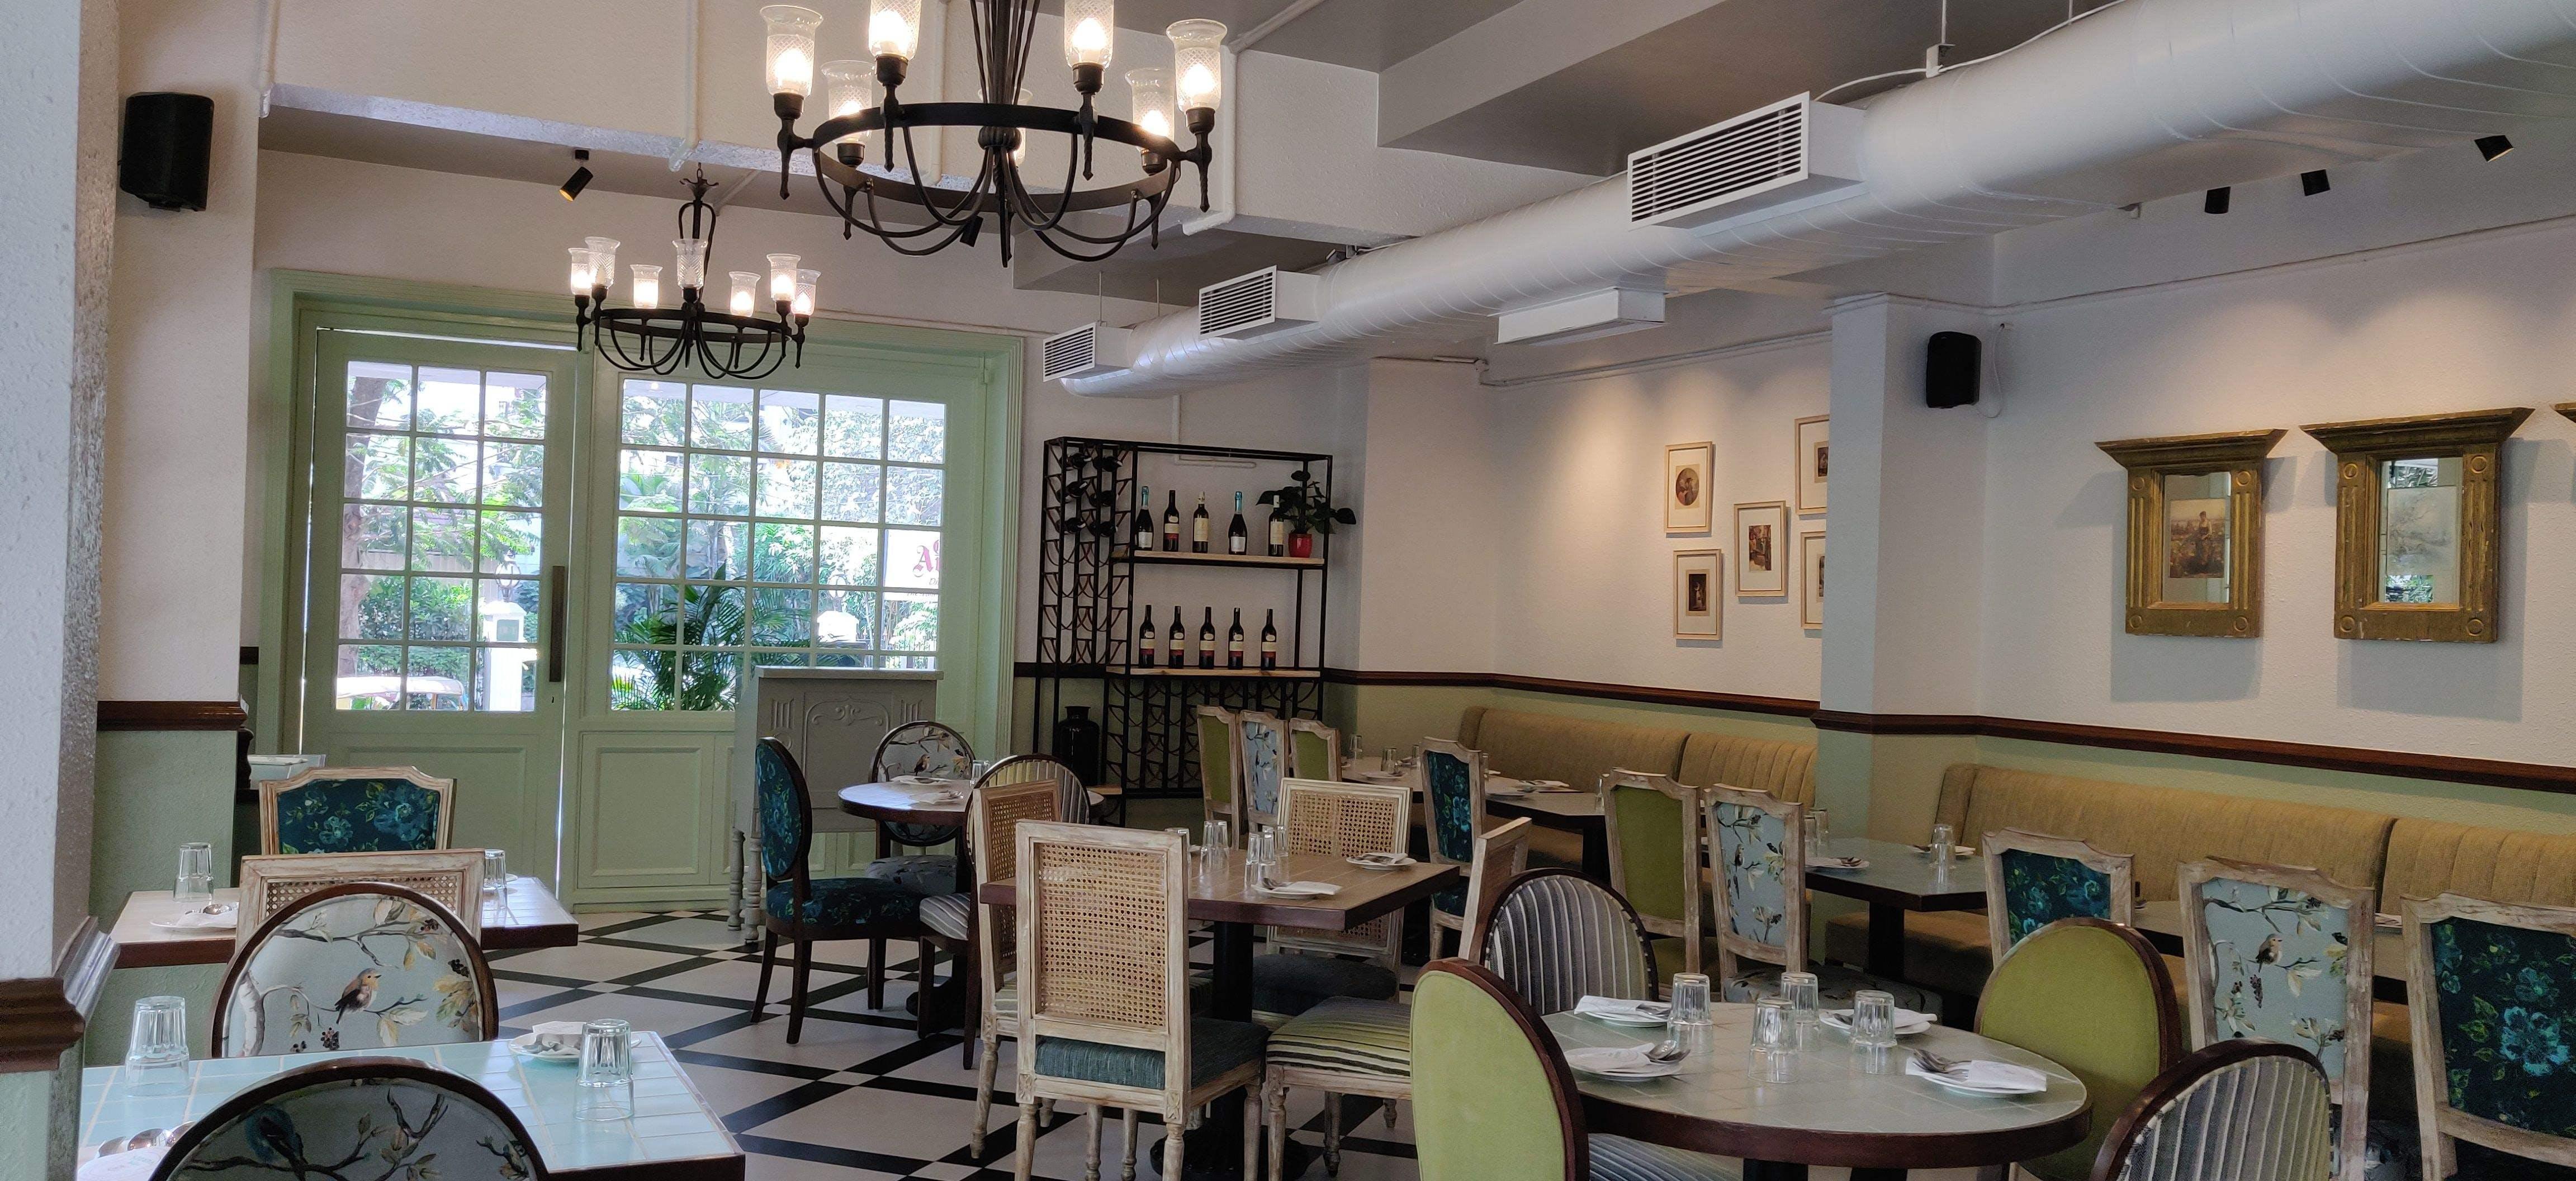 Room,Restaurant,Building,Property,Interior design,Ceiling,Café,Dining room,Cafeteria,Table